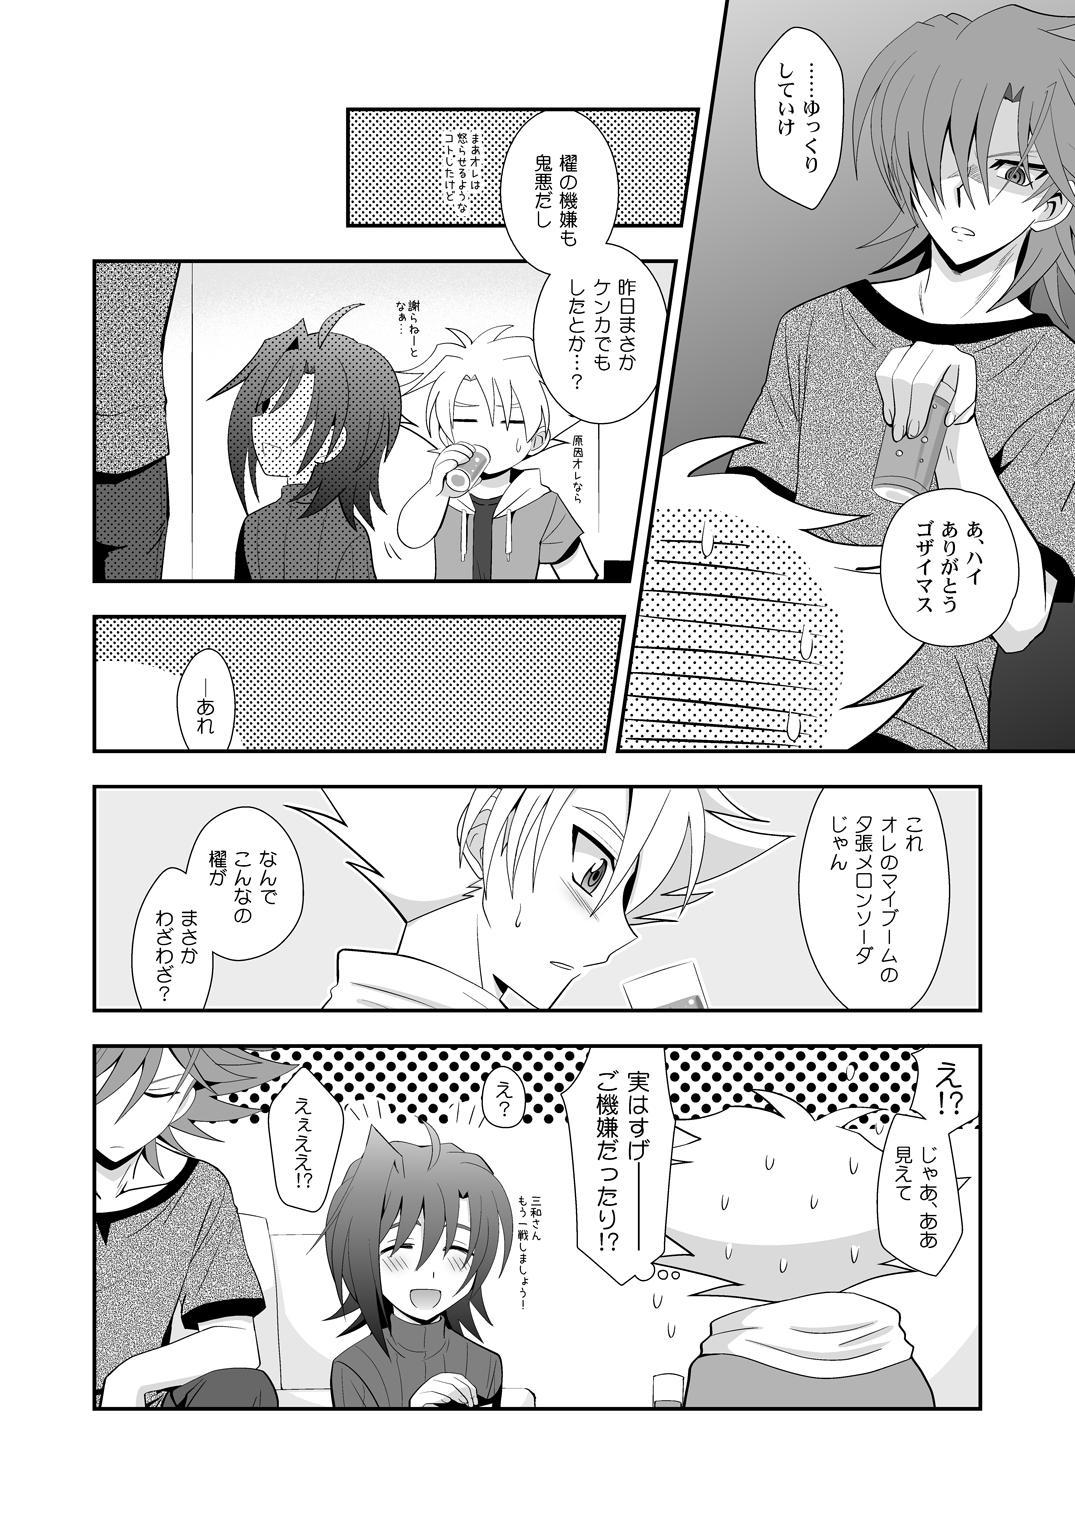 Toshiki mada 1○ dakara 30